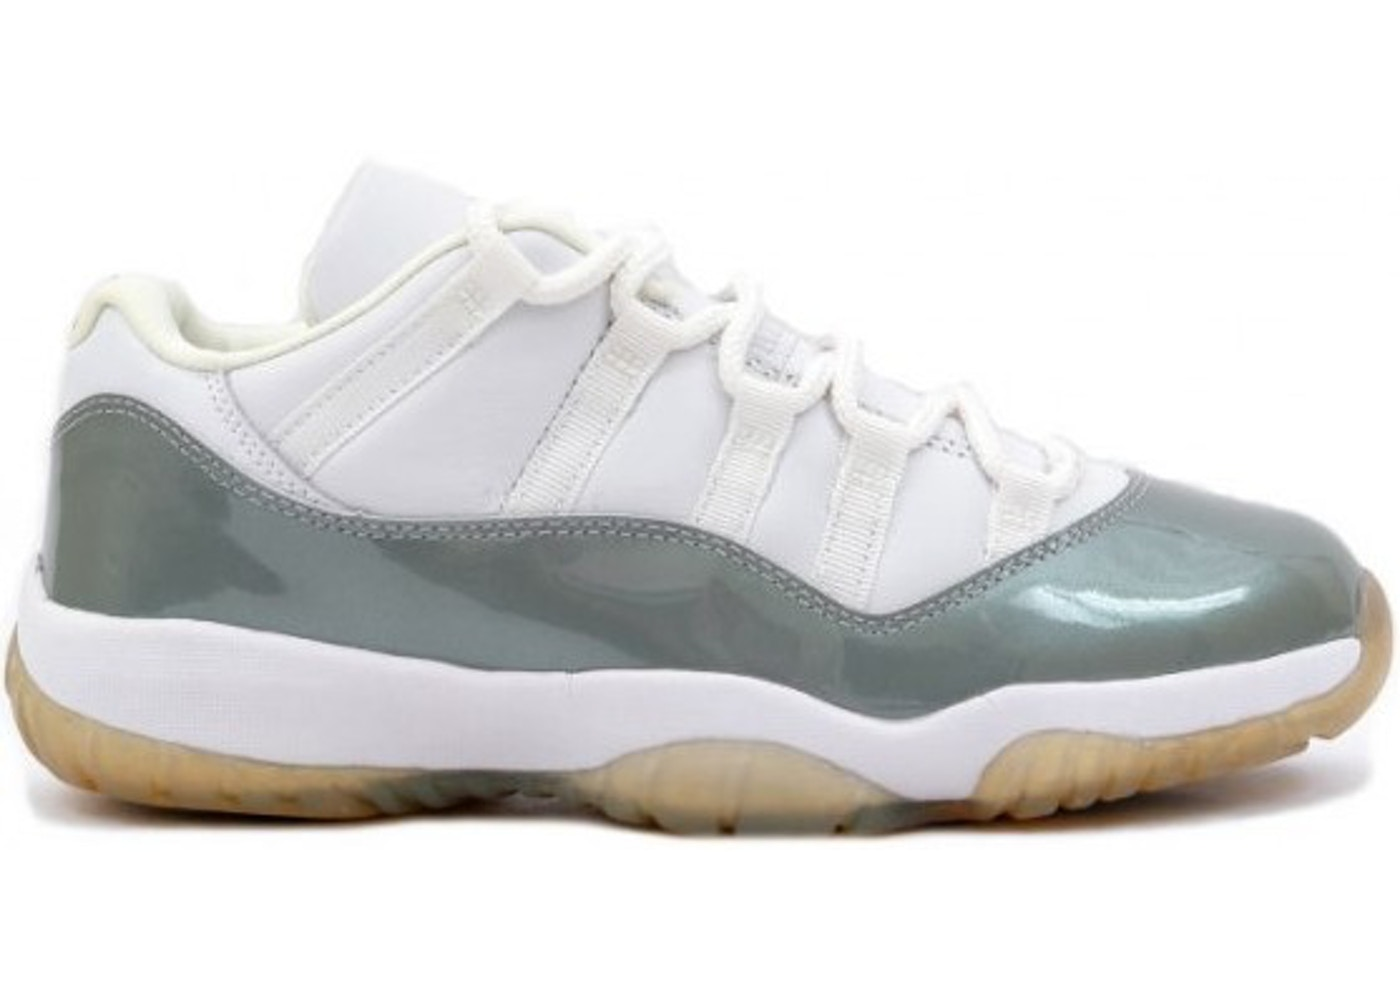 849e0aab95f159 Air Jordan 11 Shoes - Average Sale Price